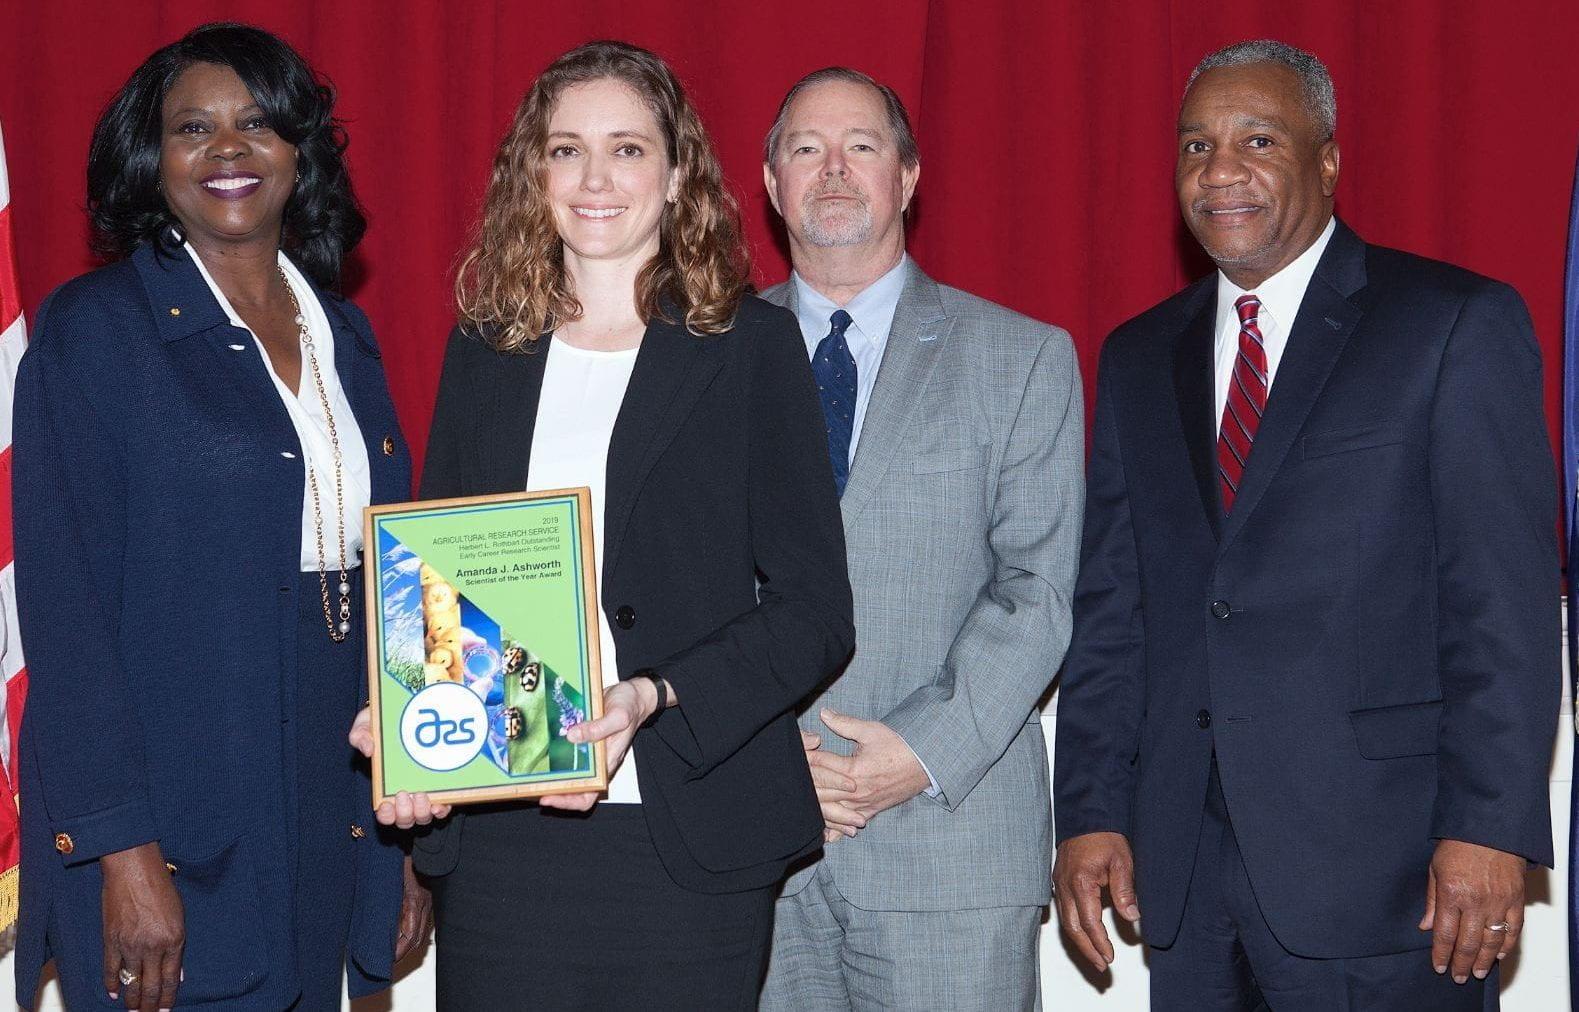 Amanda Ashworth Receives National Early Career Award from USDA-ARS